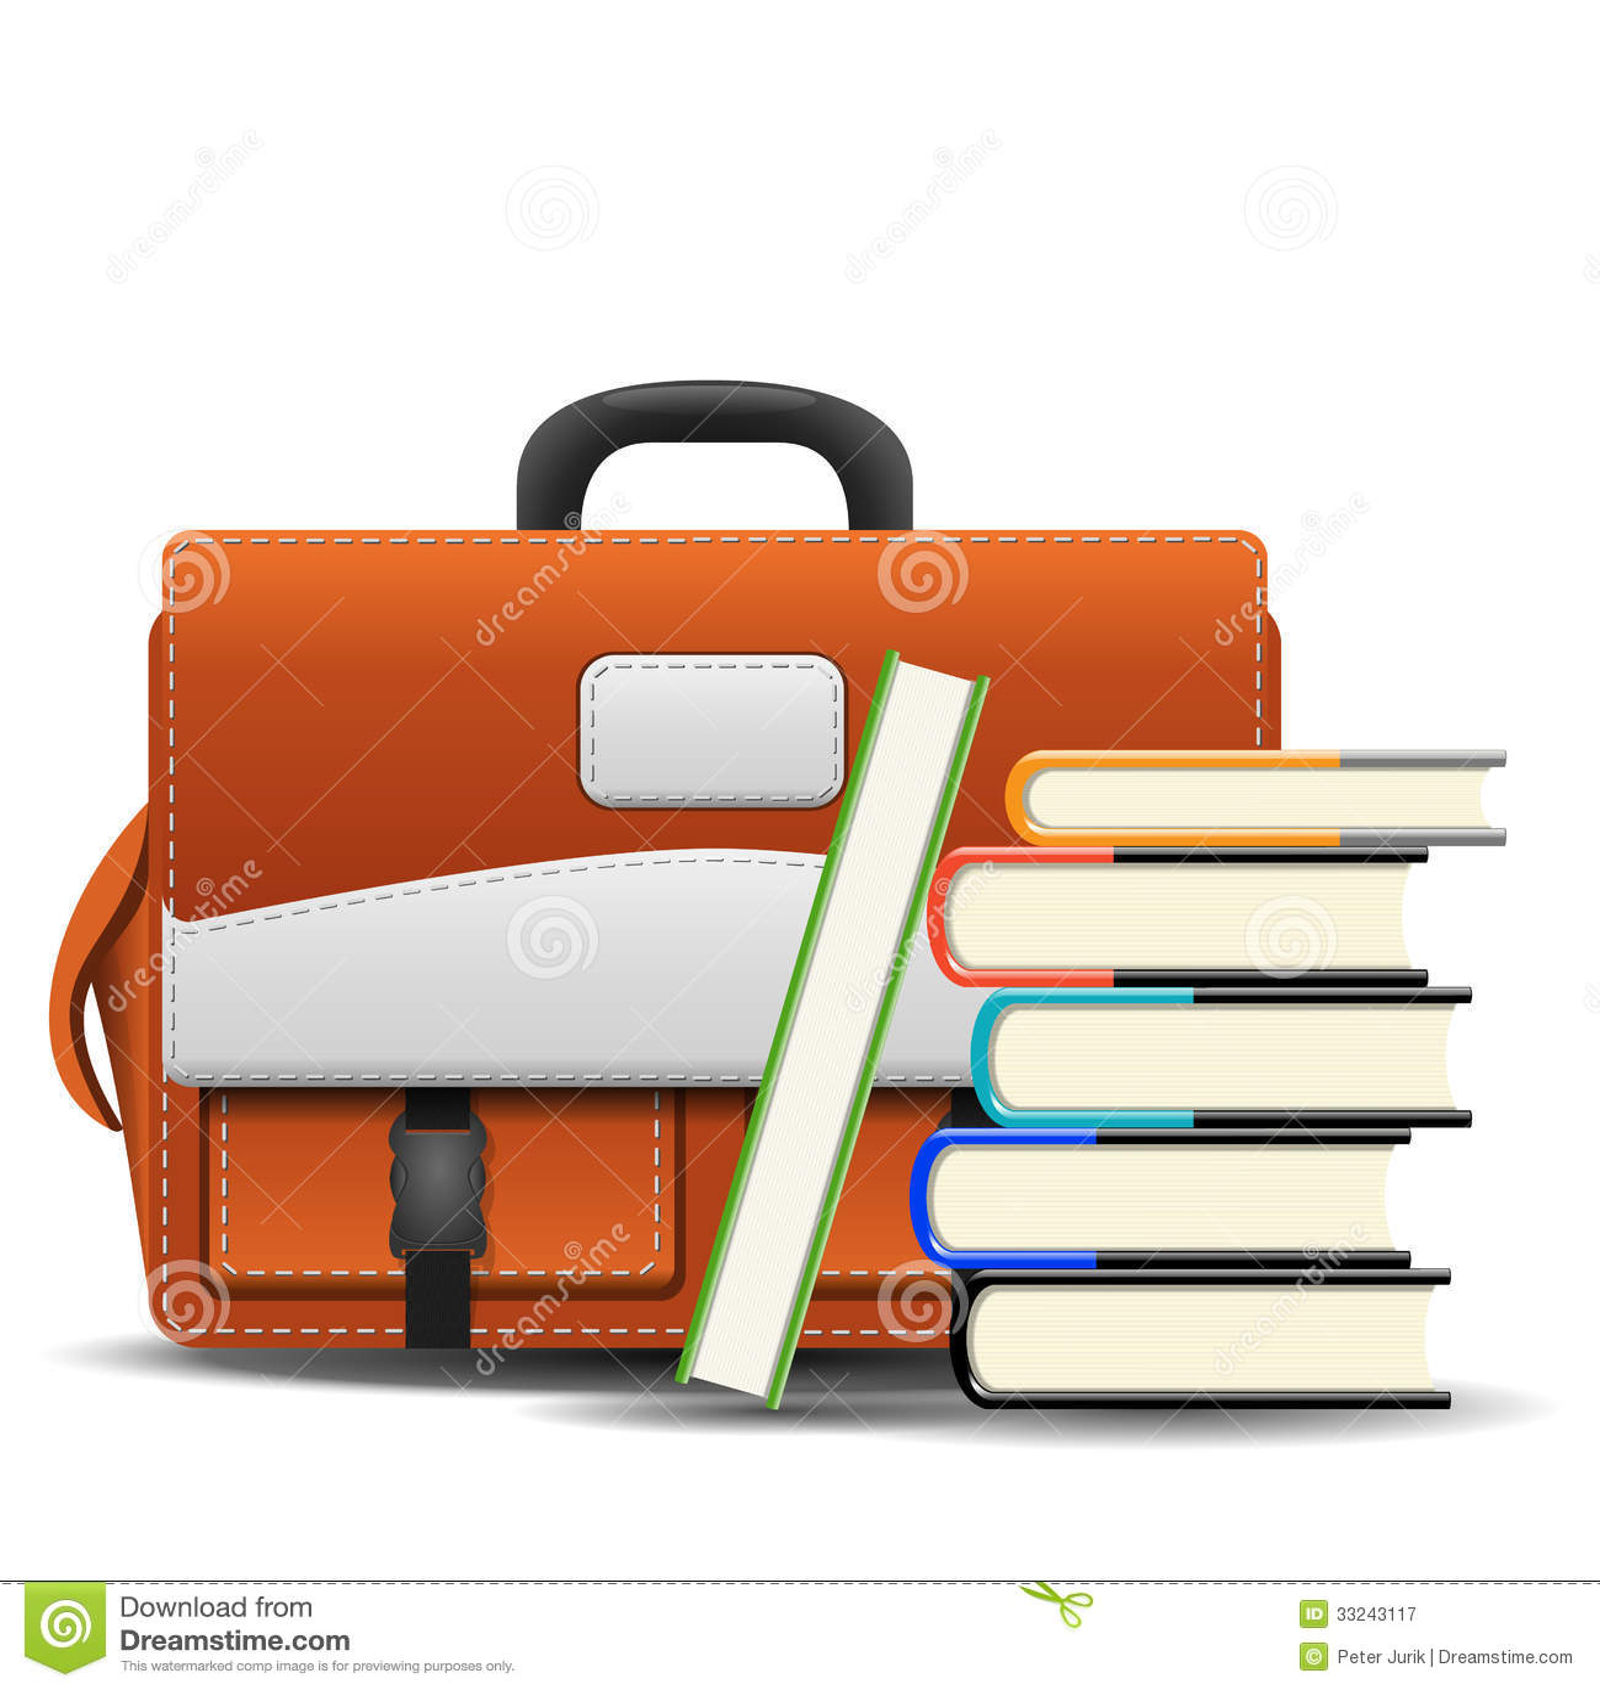 School bag diagram - School Bag With Books